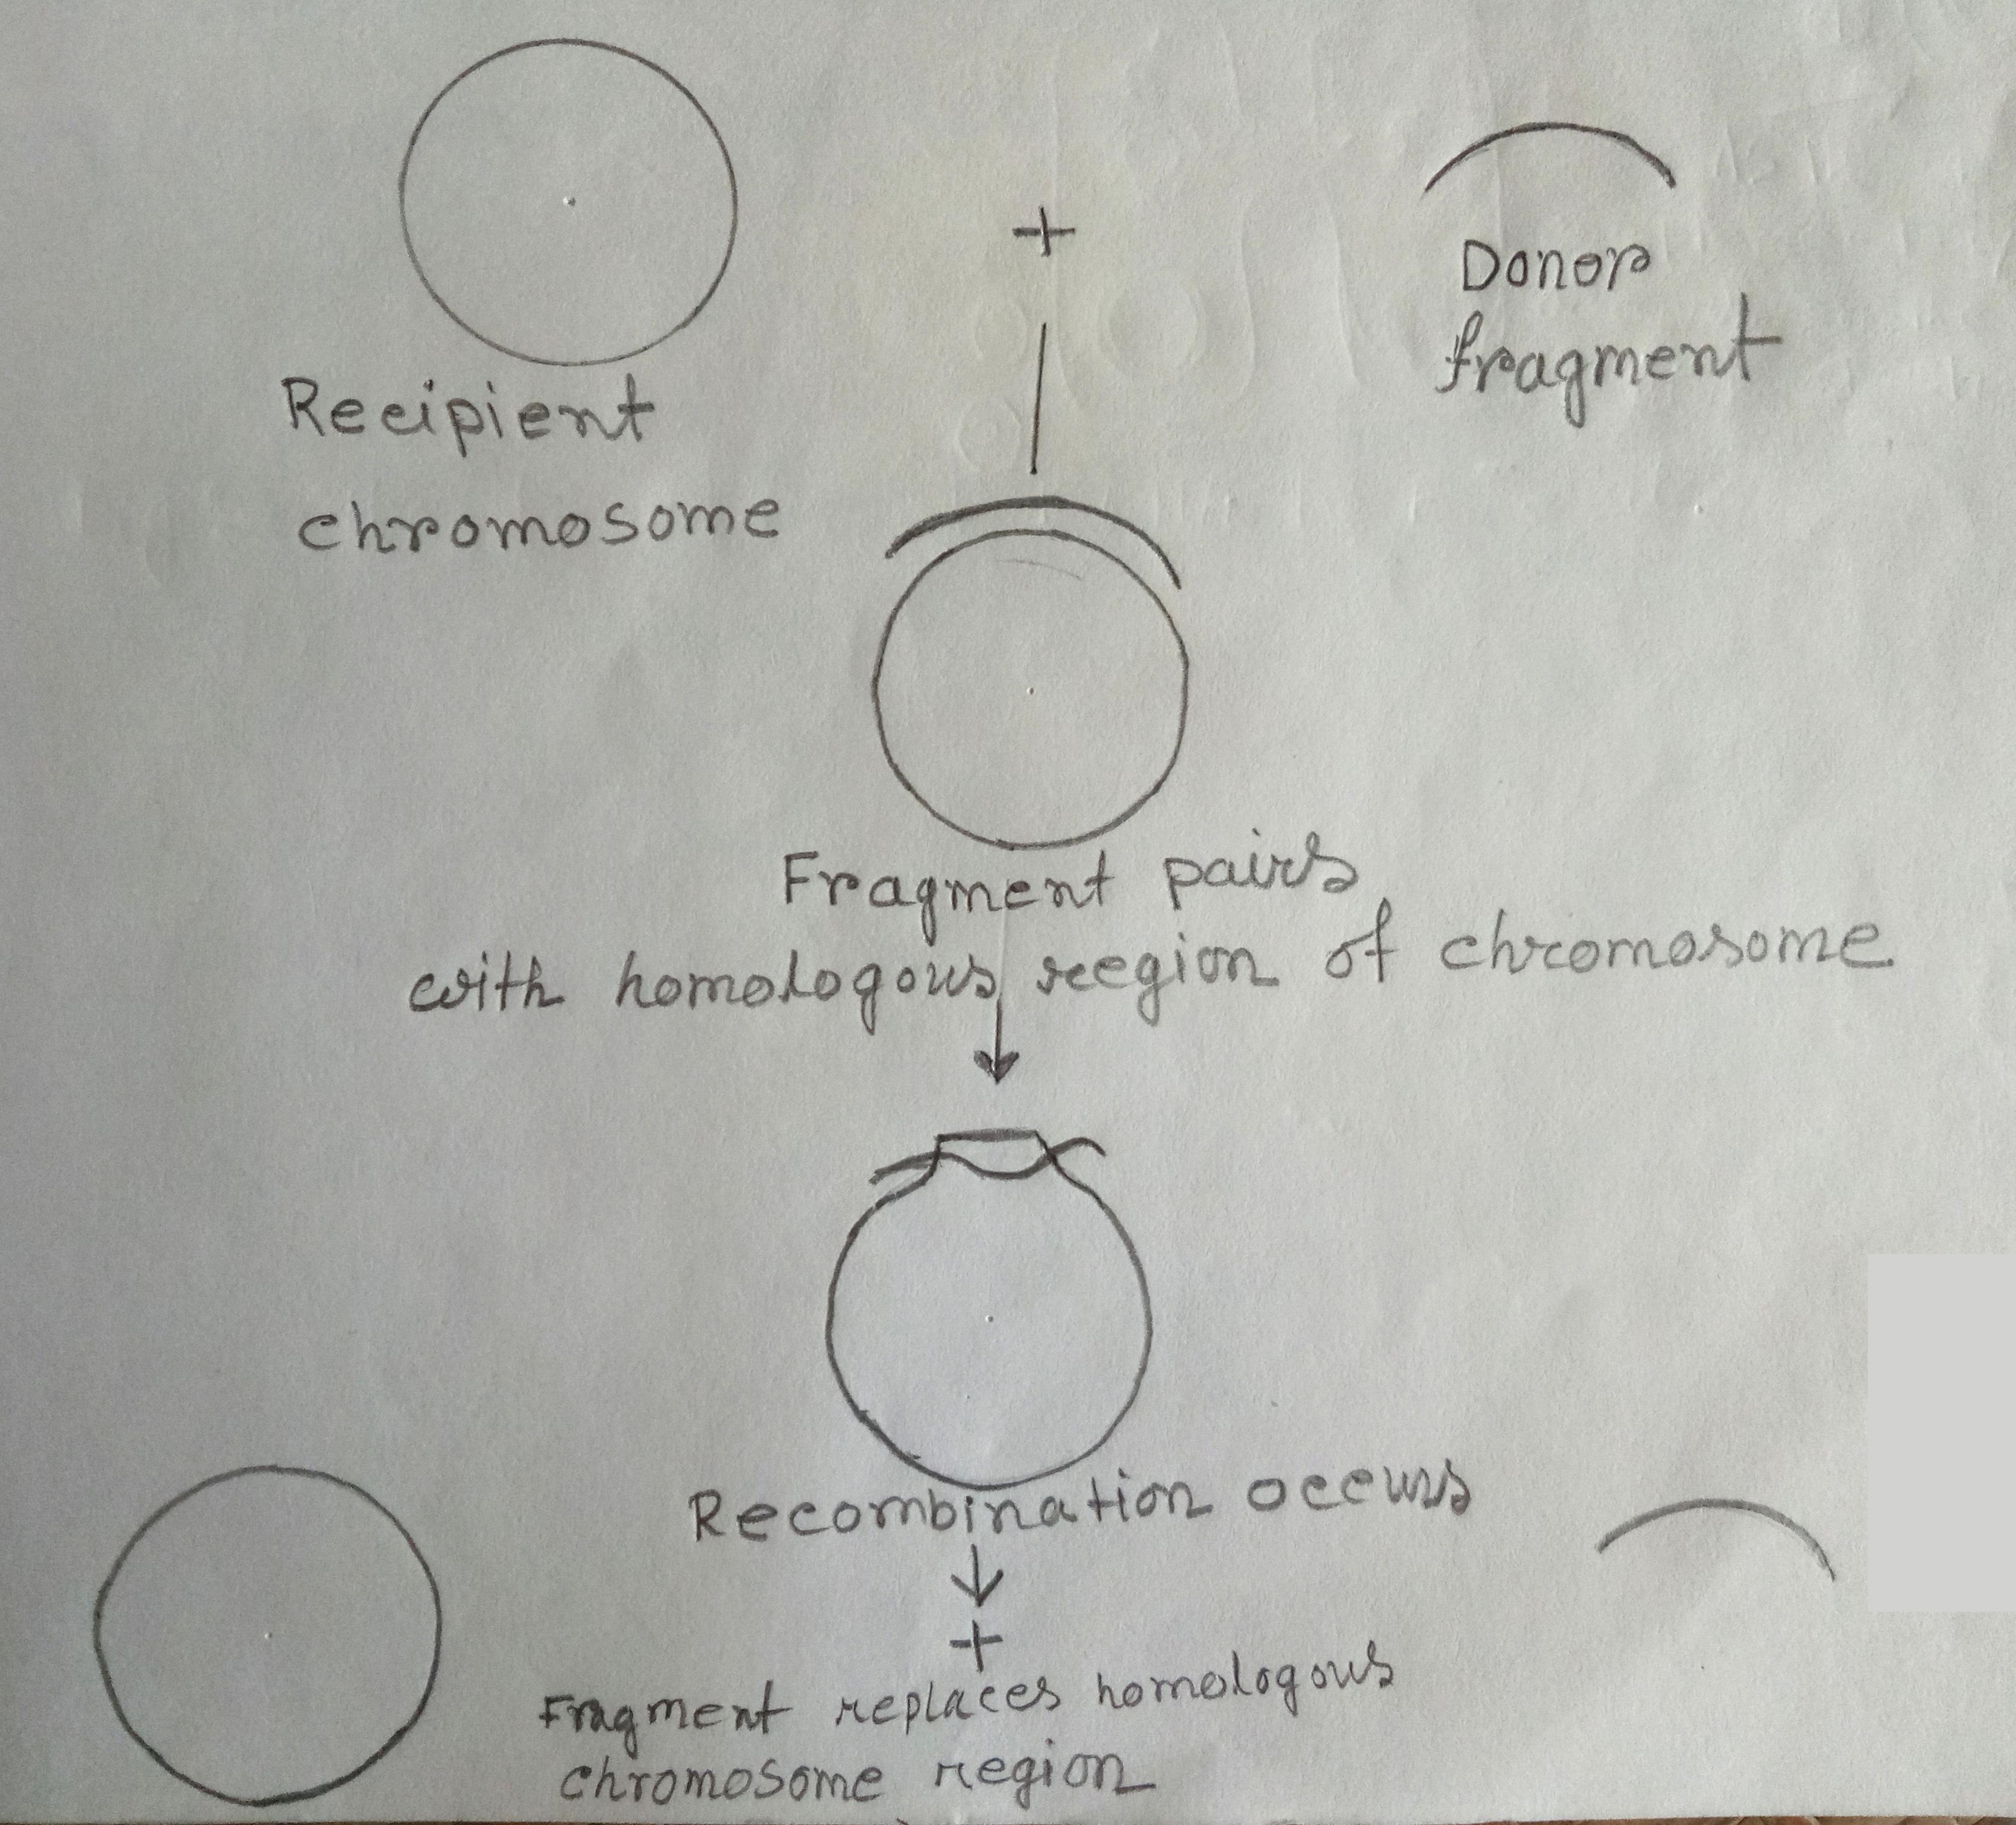 Recombination between donor chromosomal segment & recipient chromosome